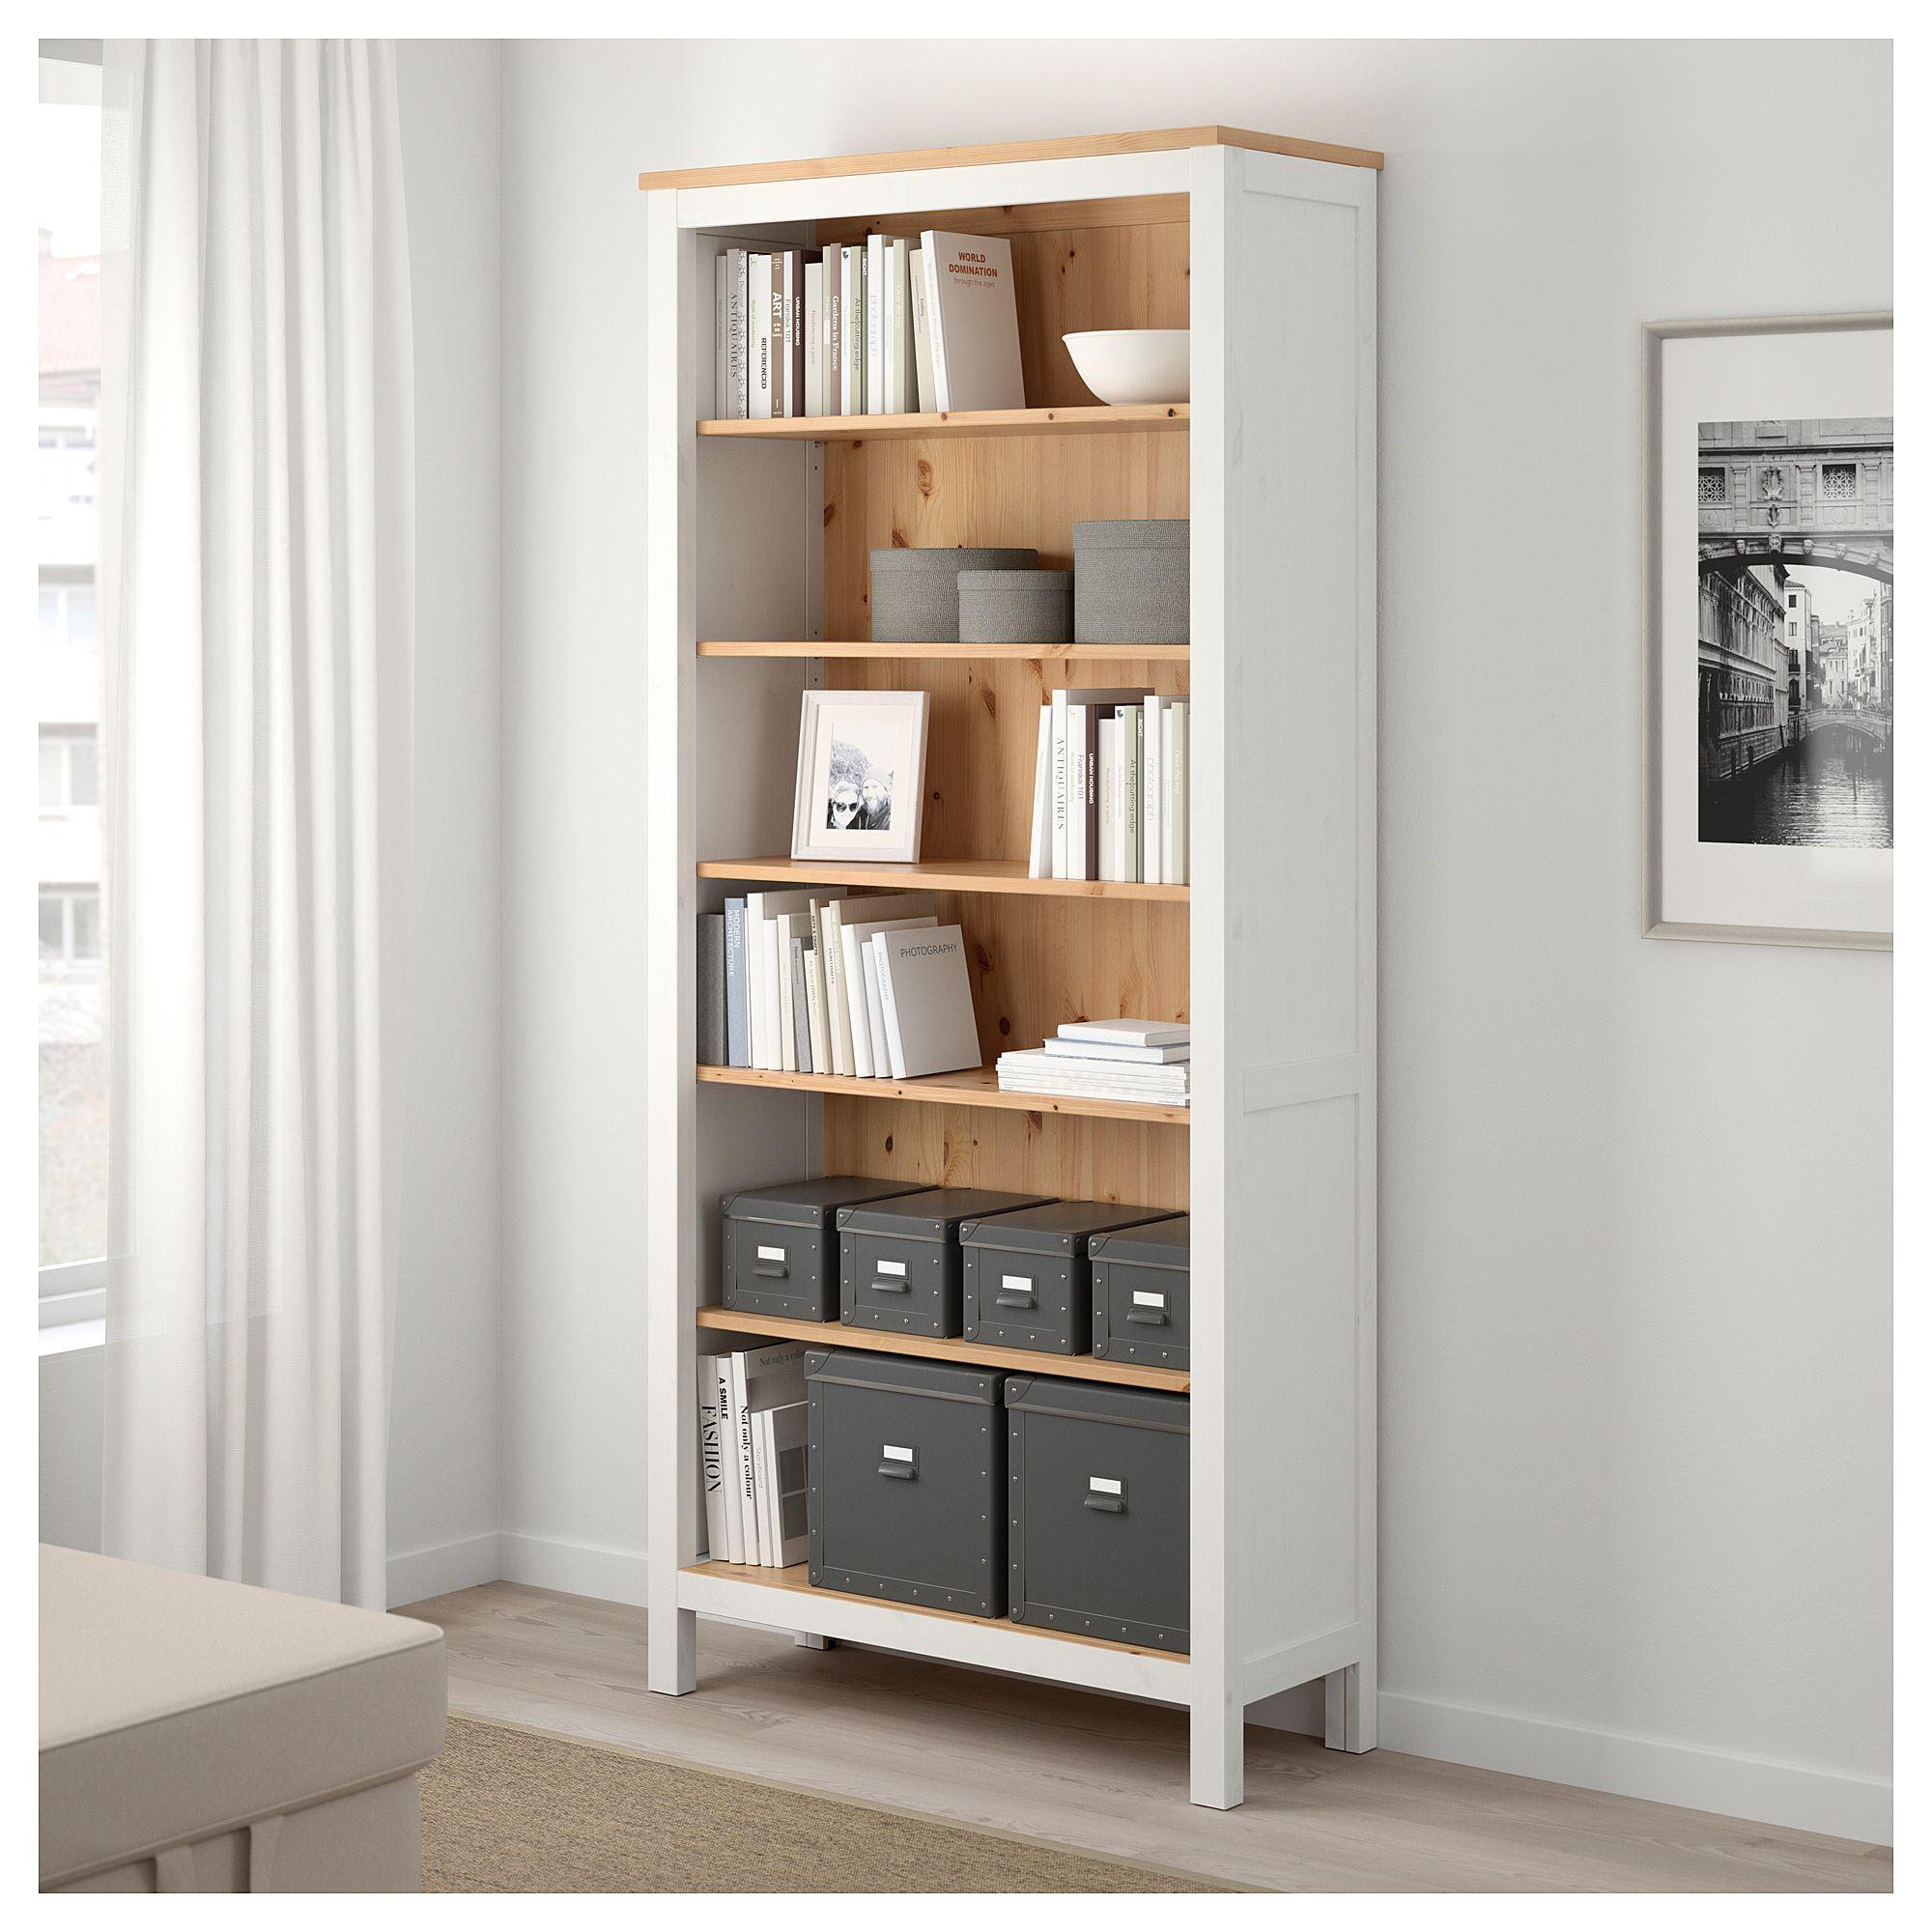 ikea hemnes bookcase white stain light brown in 2019 ikea hemnes bookcase hemnes bookcase